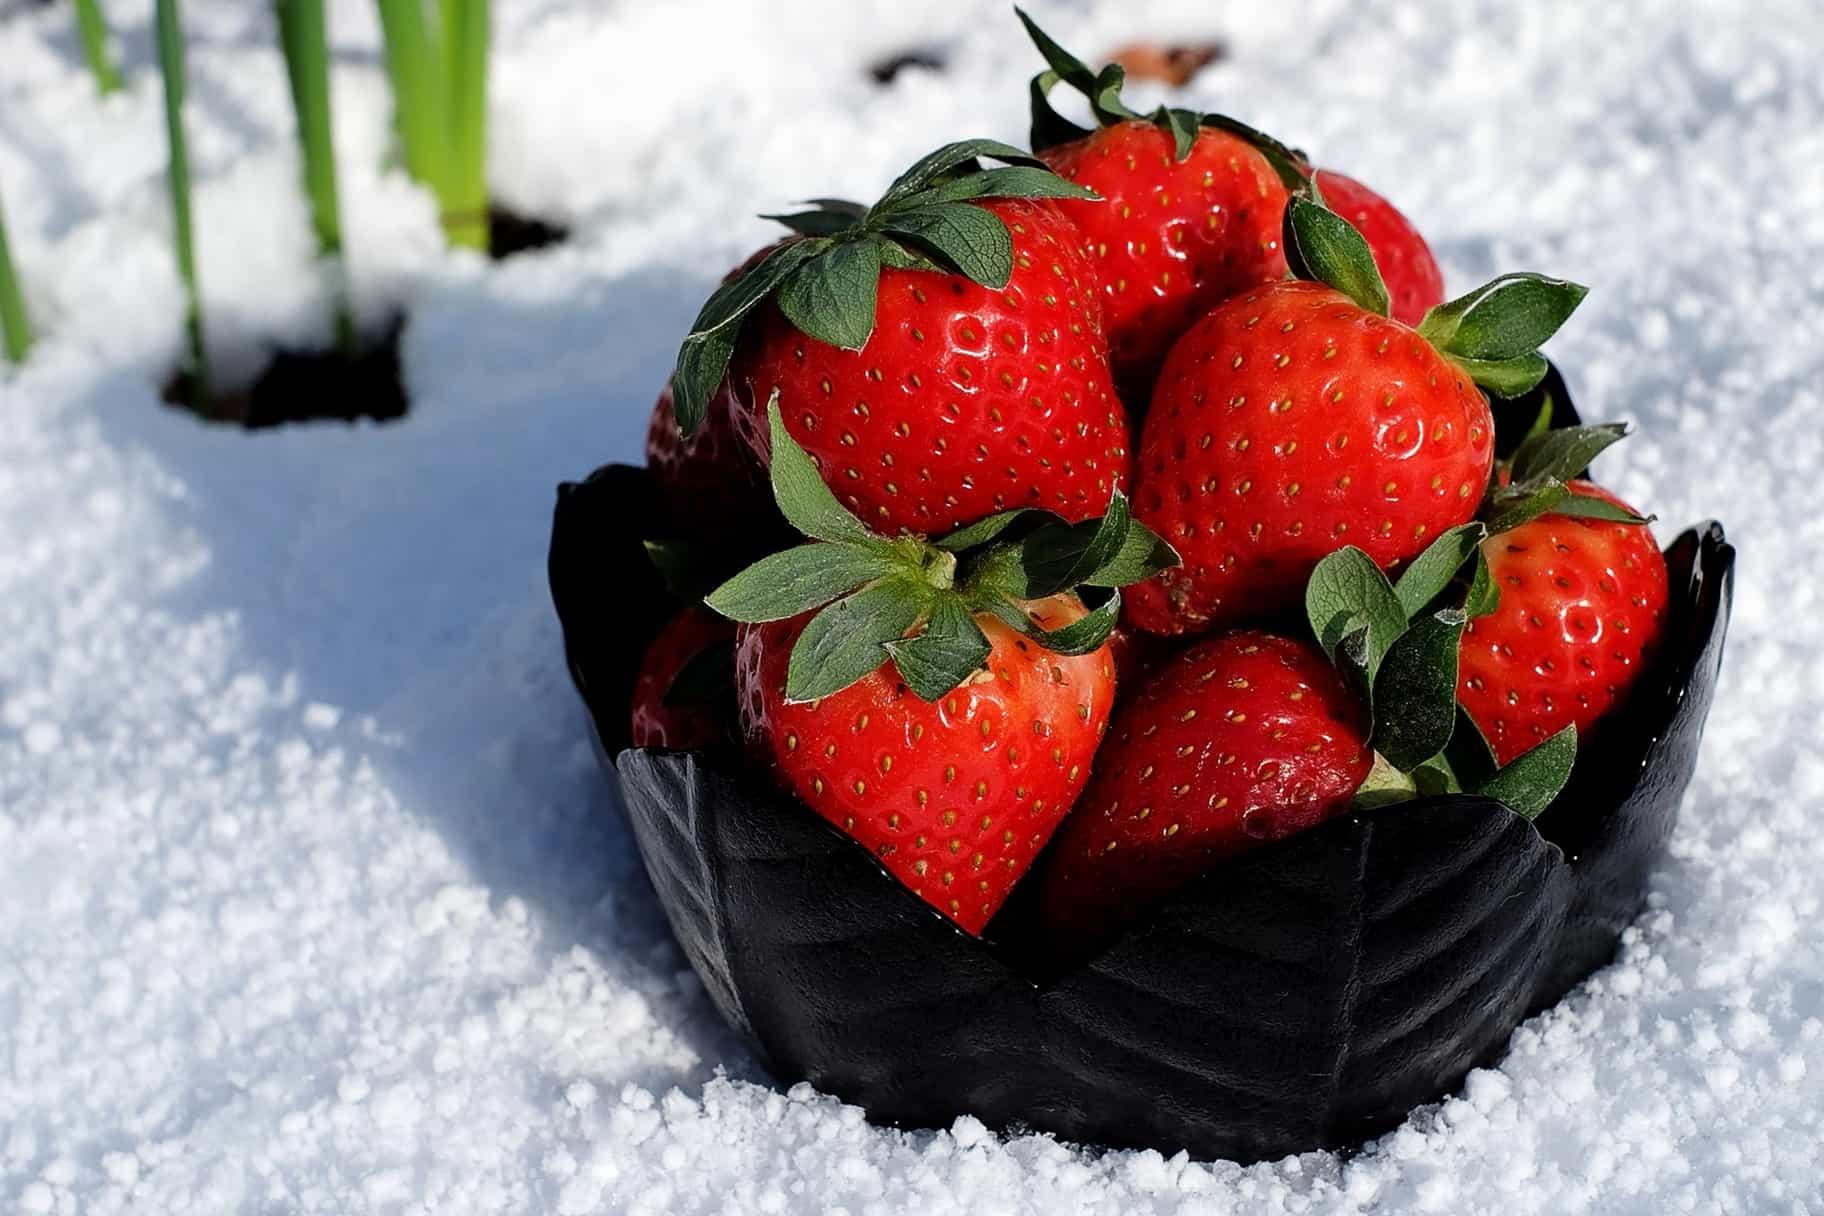 imagen gratis nieve invierno fruta comida fresa. Black Bedroom Furniture Sets. Home Design Ideas